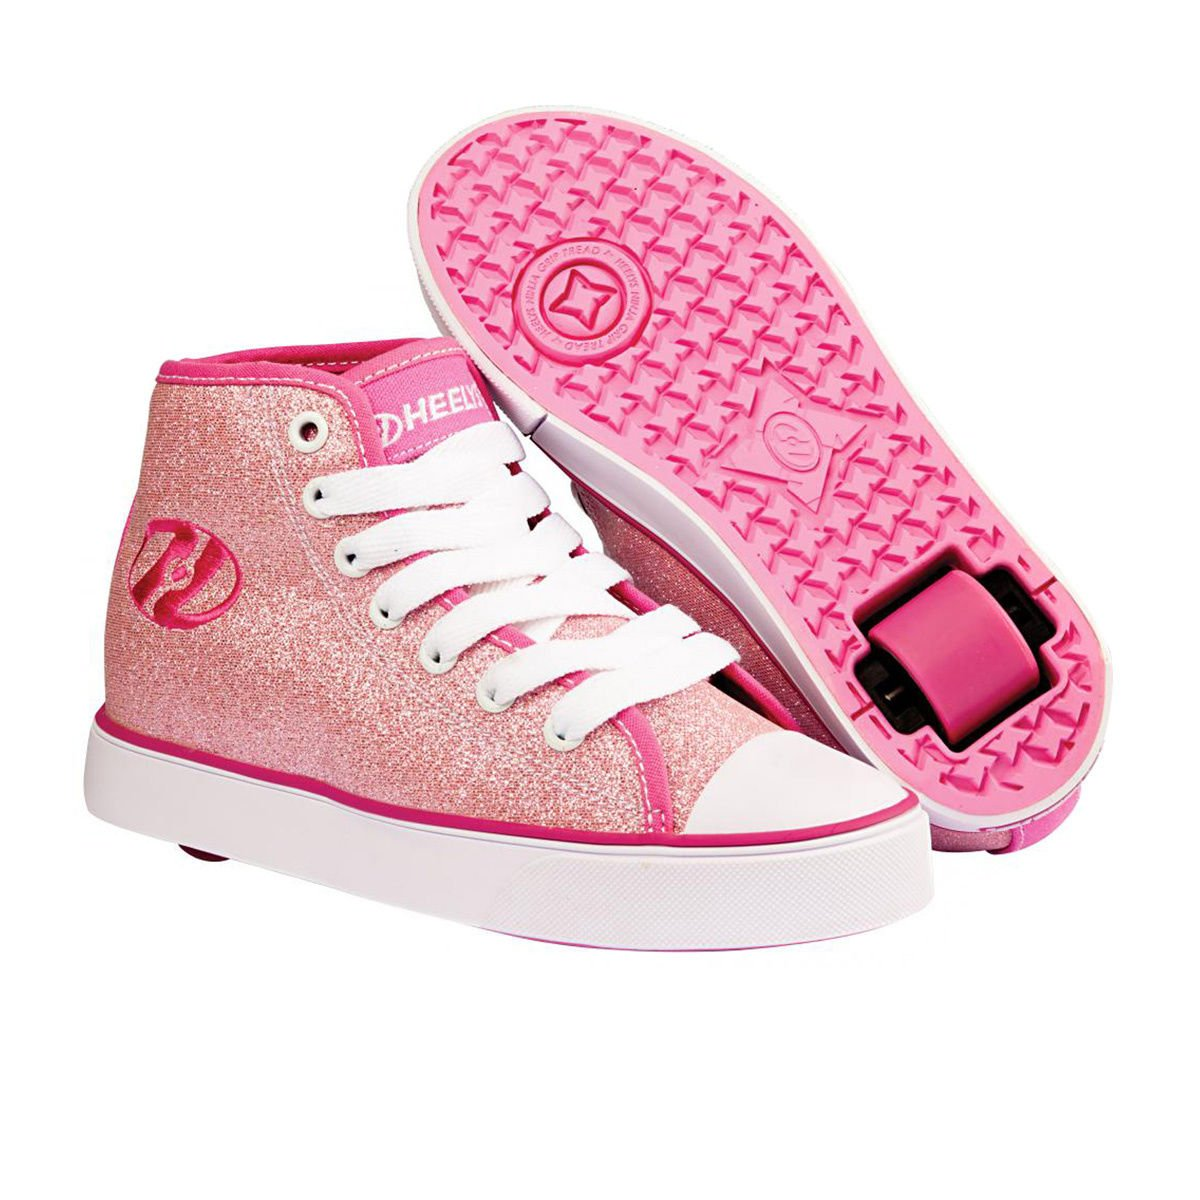 Chaussures Veloz Heelys - Rose Glitter   avis de plus amples informations